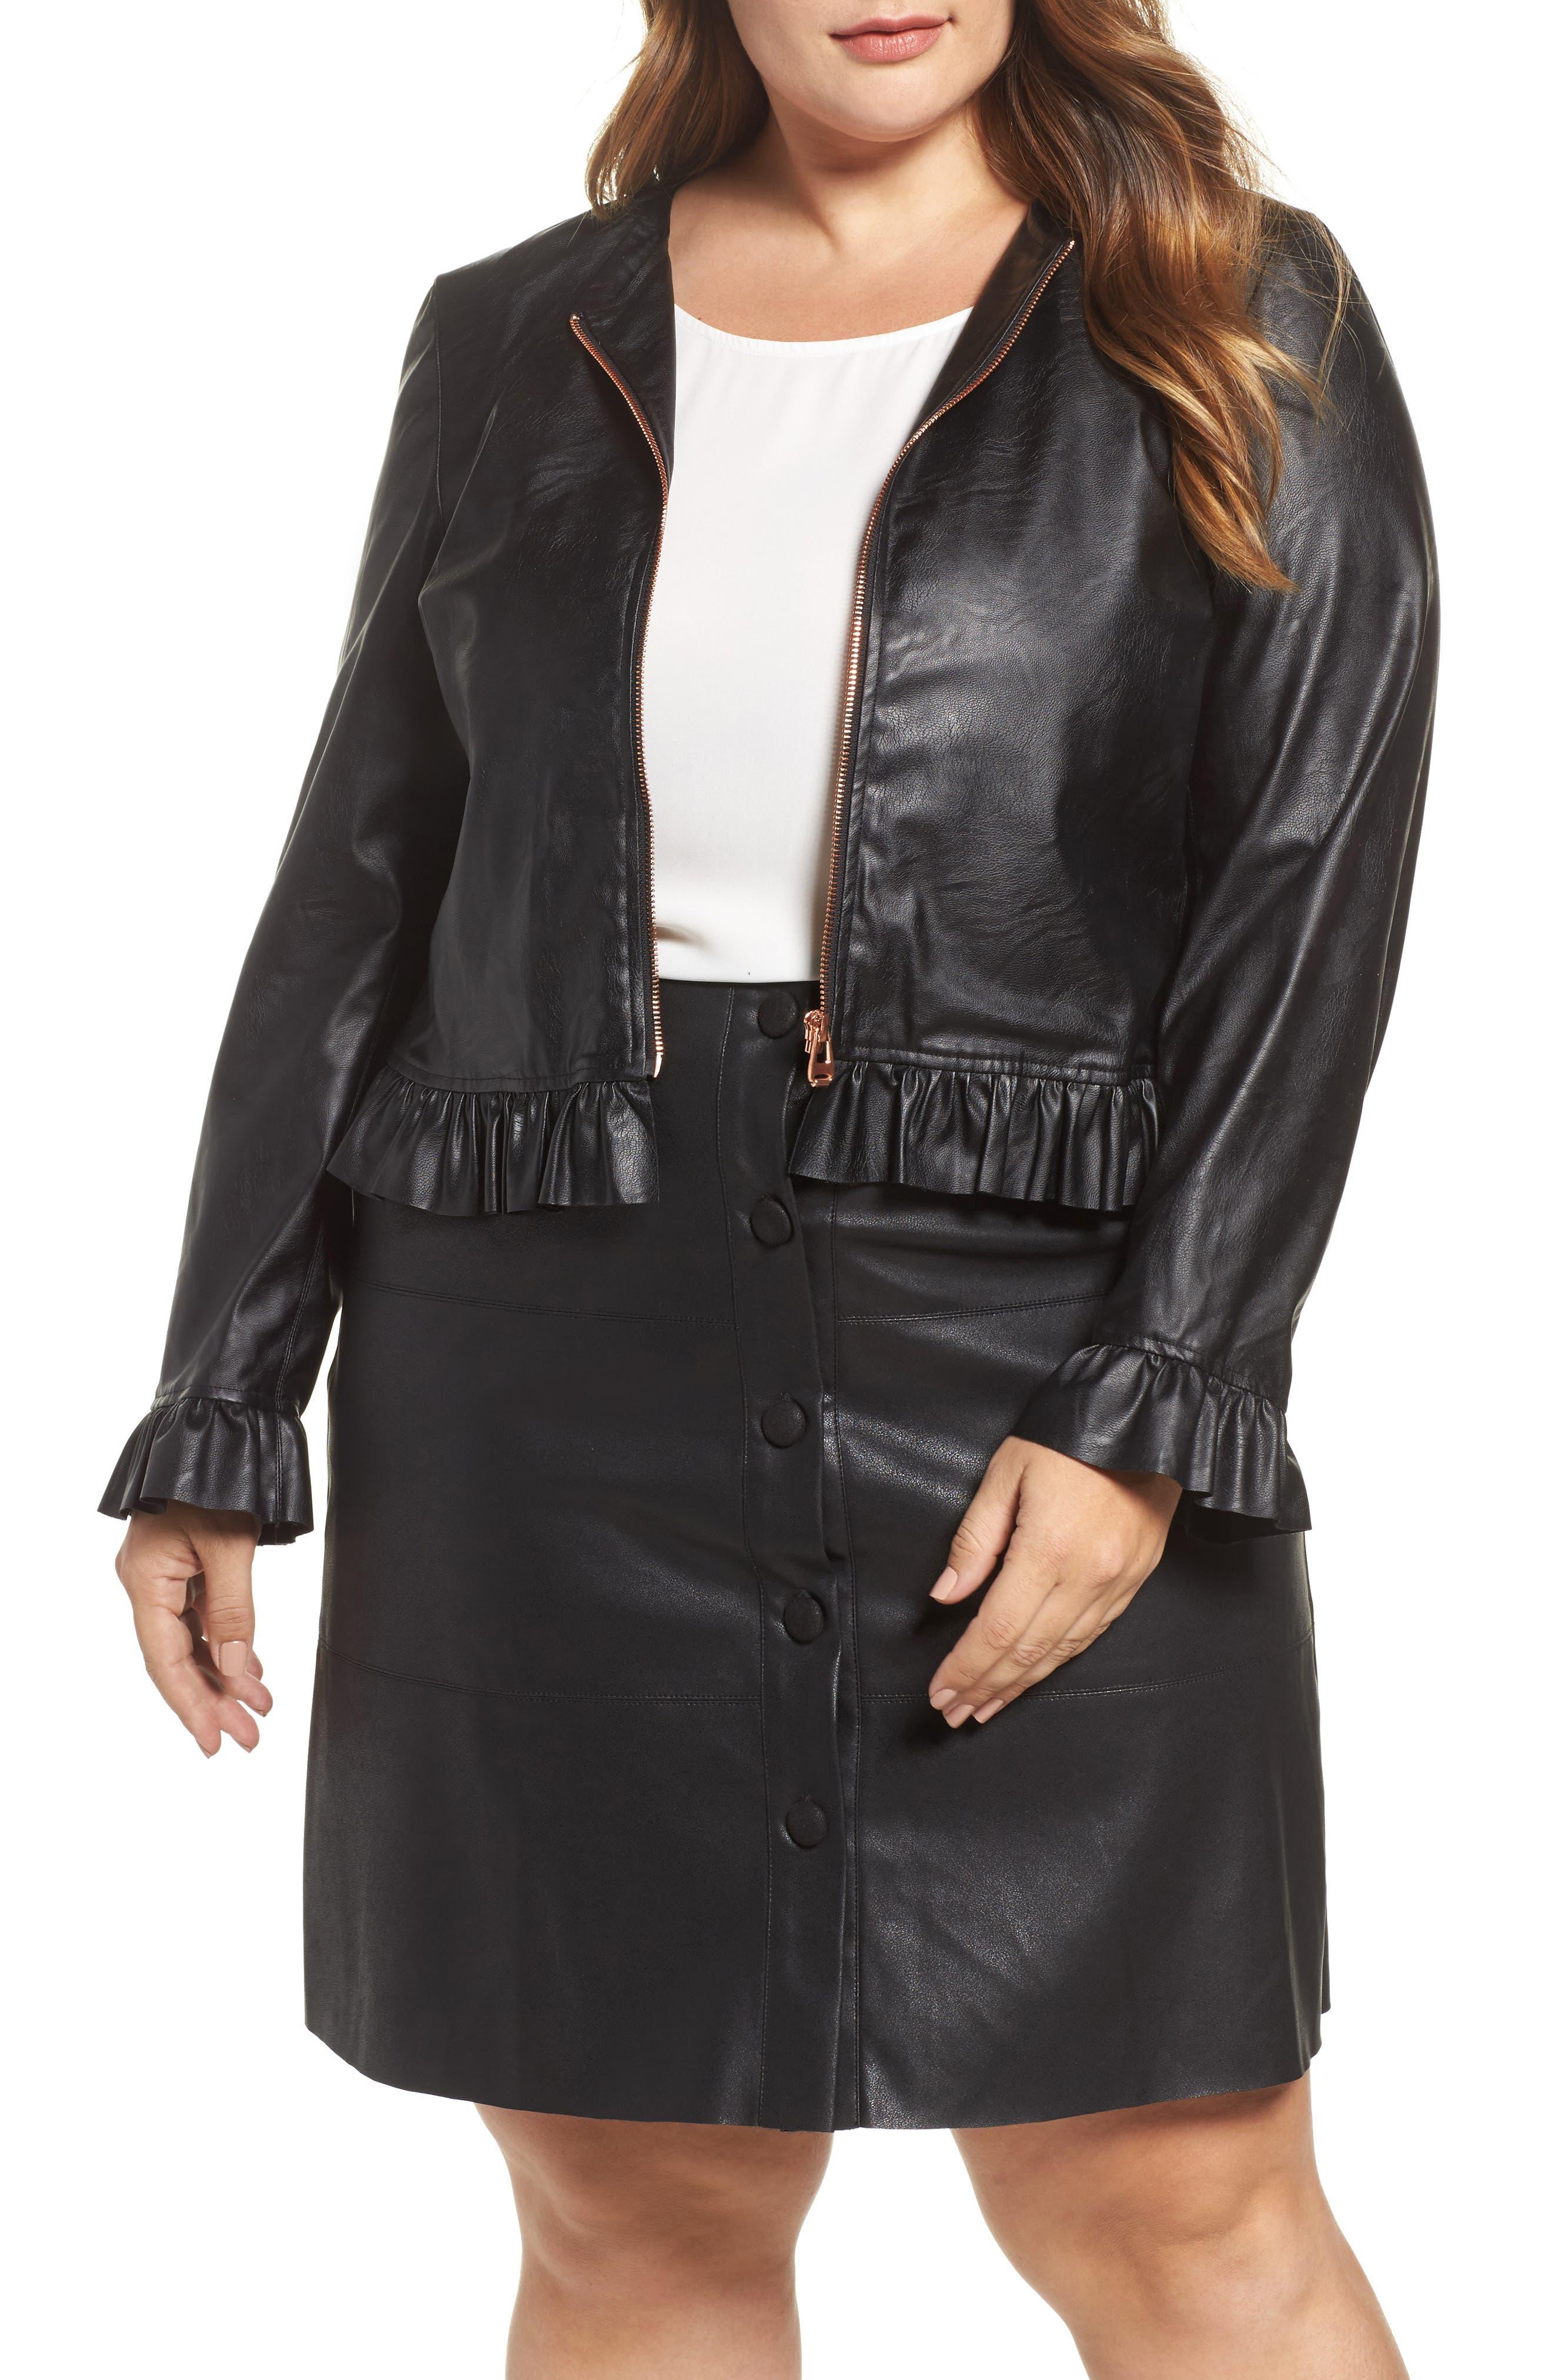 Alternate Image 1 Selected - ELVI Faux Leather Frill Jacket (Plus Size)